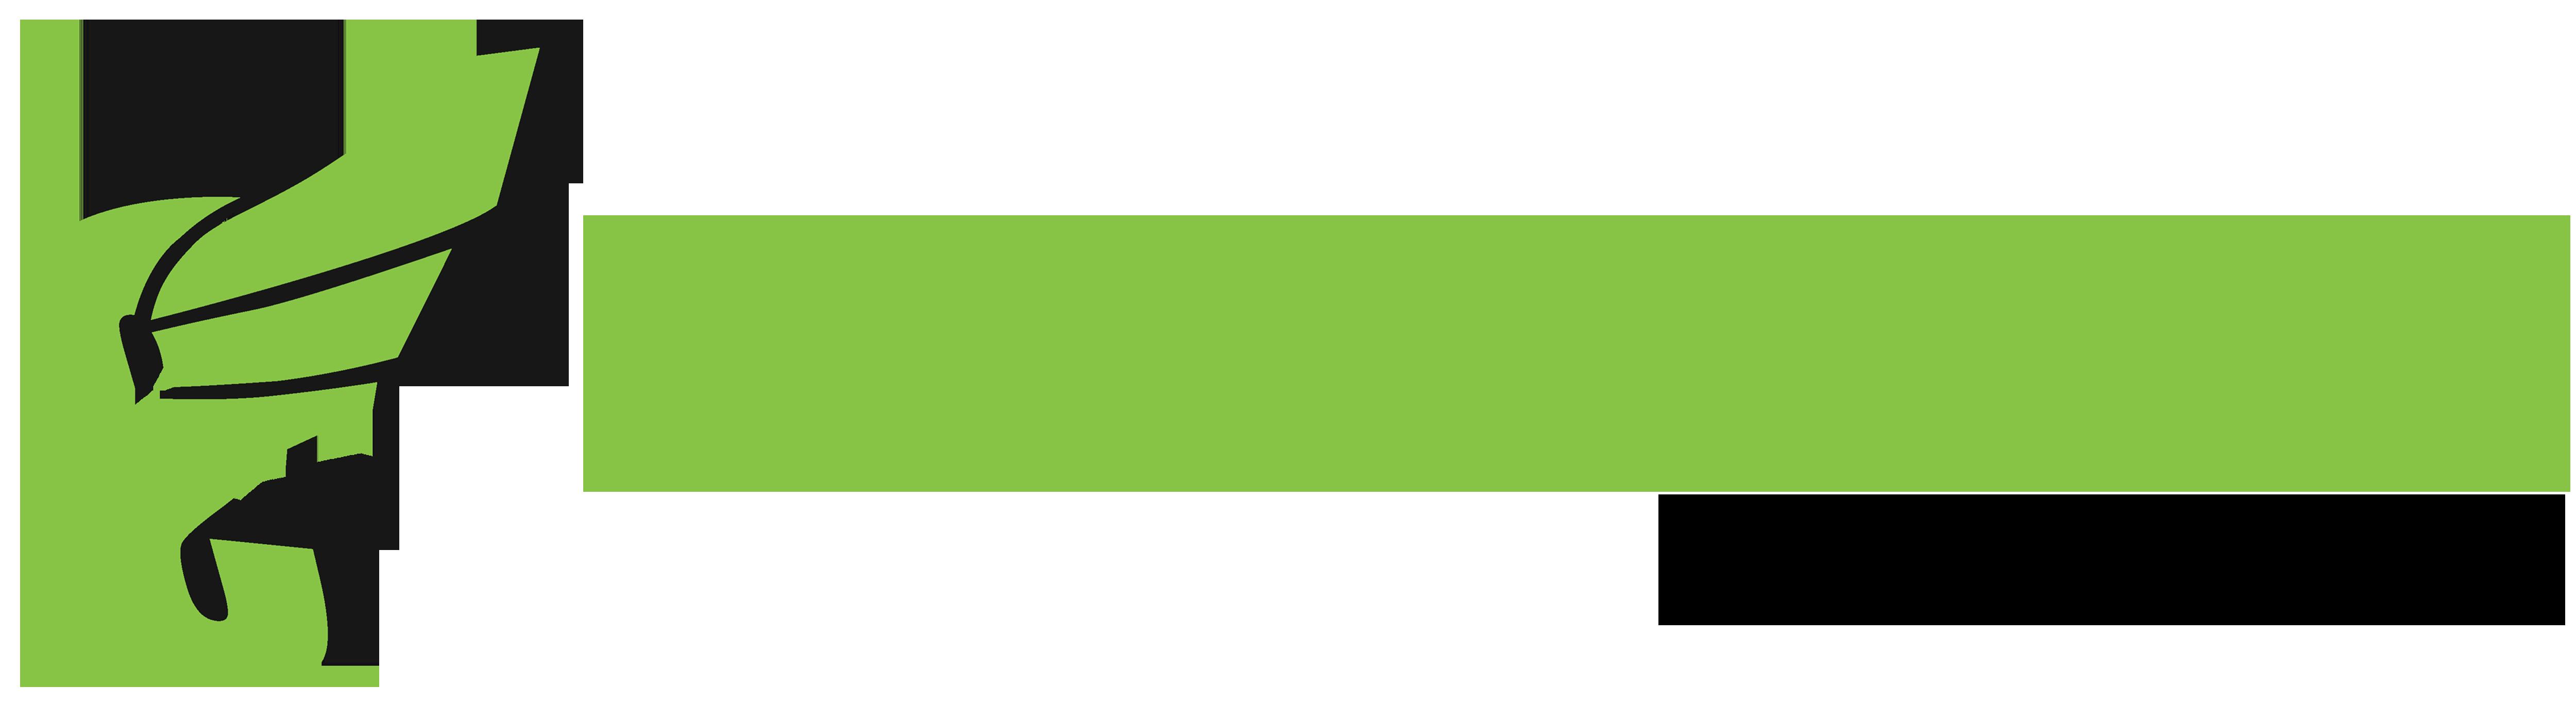 Skochypstiks